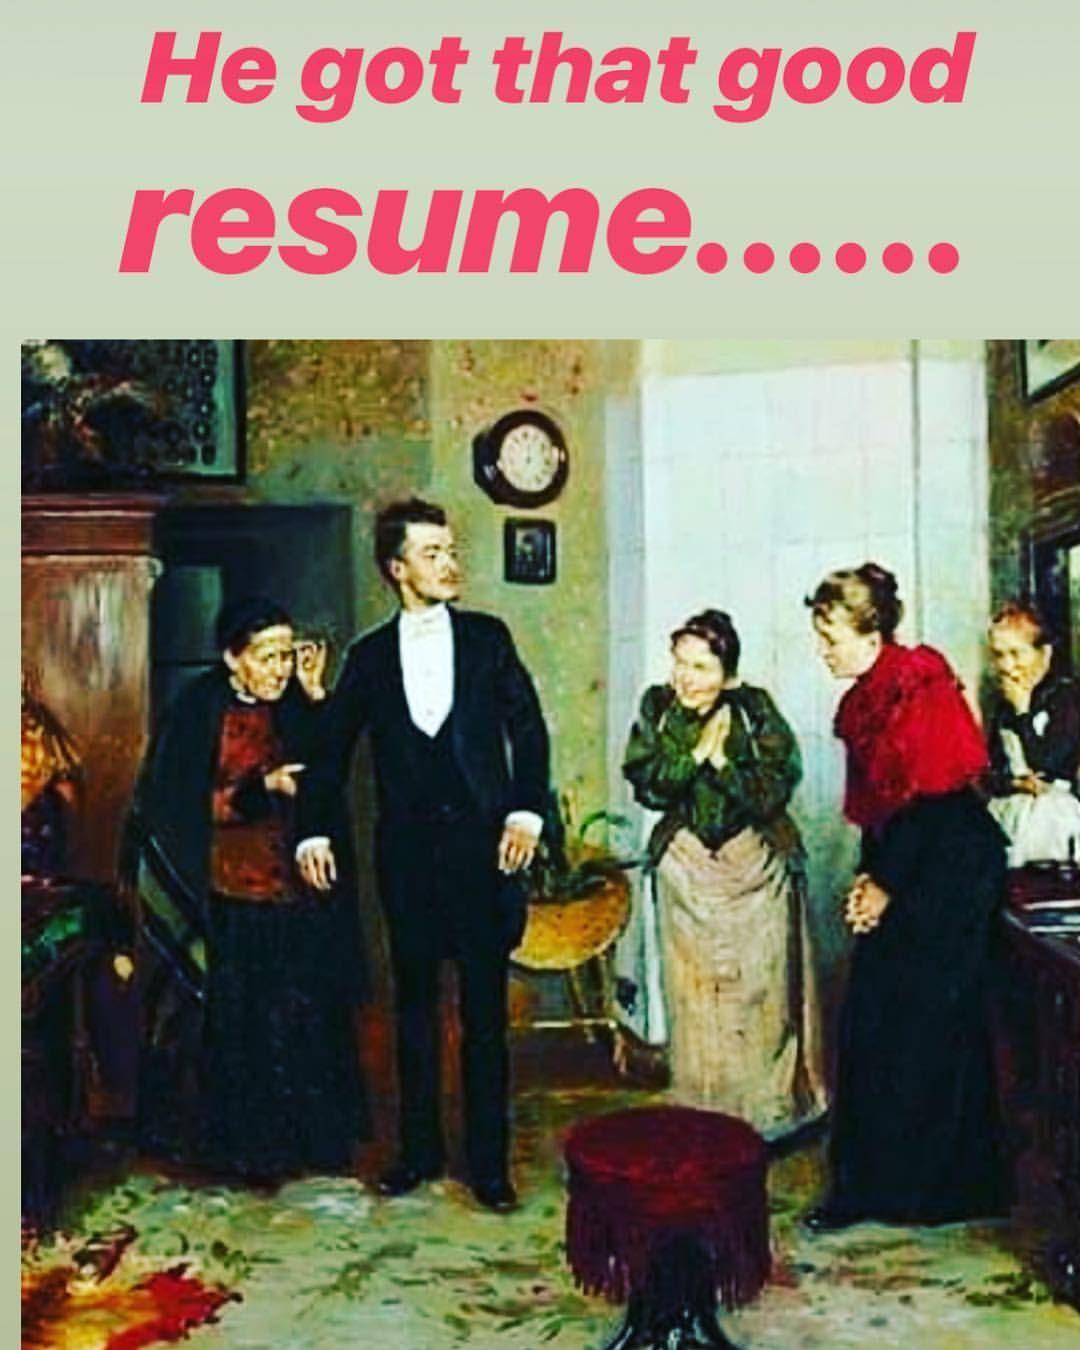 Get that good resume link in bio resume resumes job